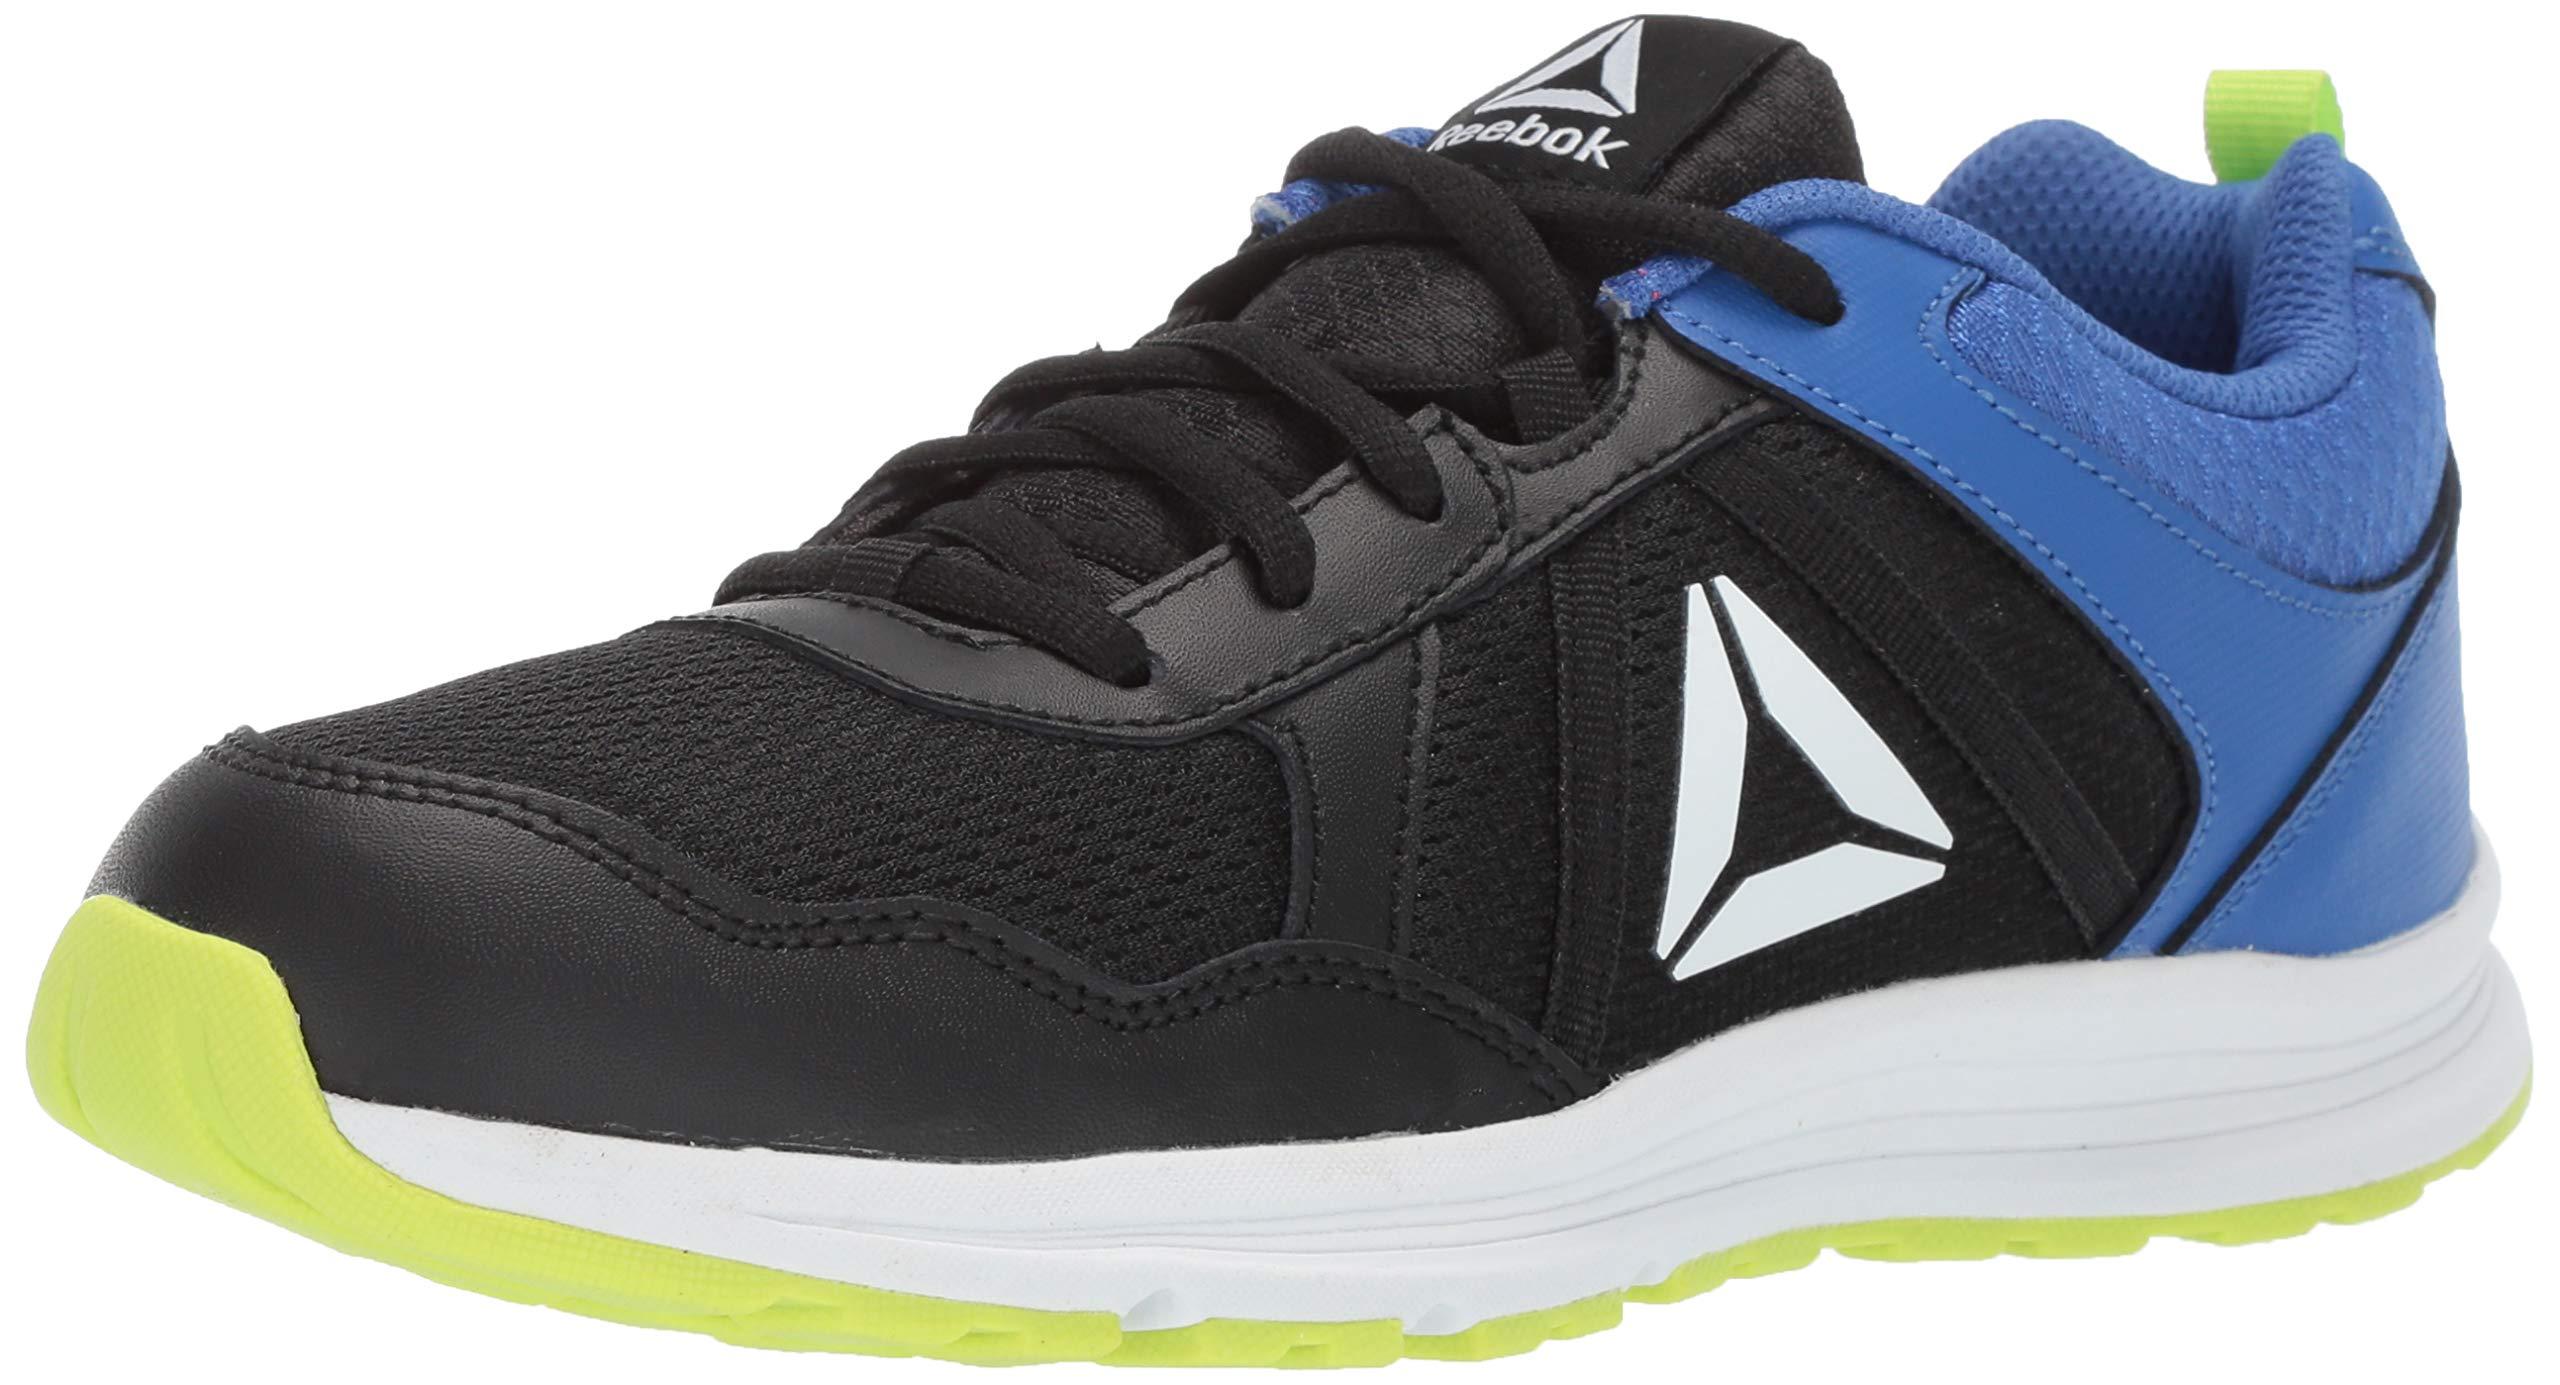 Reebok Boys' Almotio 4.0 Running Shoe, Black/neon Lime/Crushed Cobalt/White, 11.5 M US Little Kid